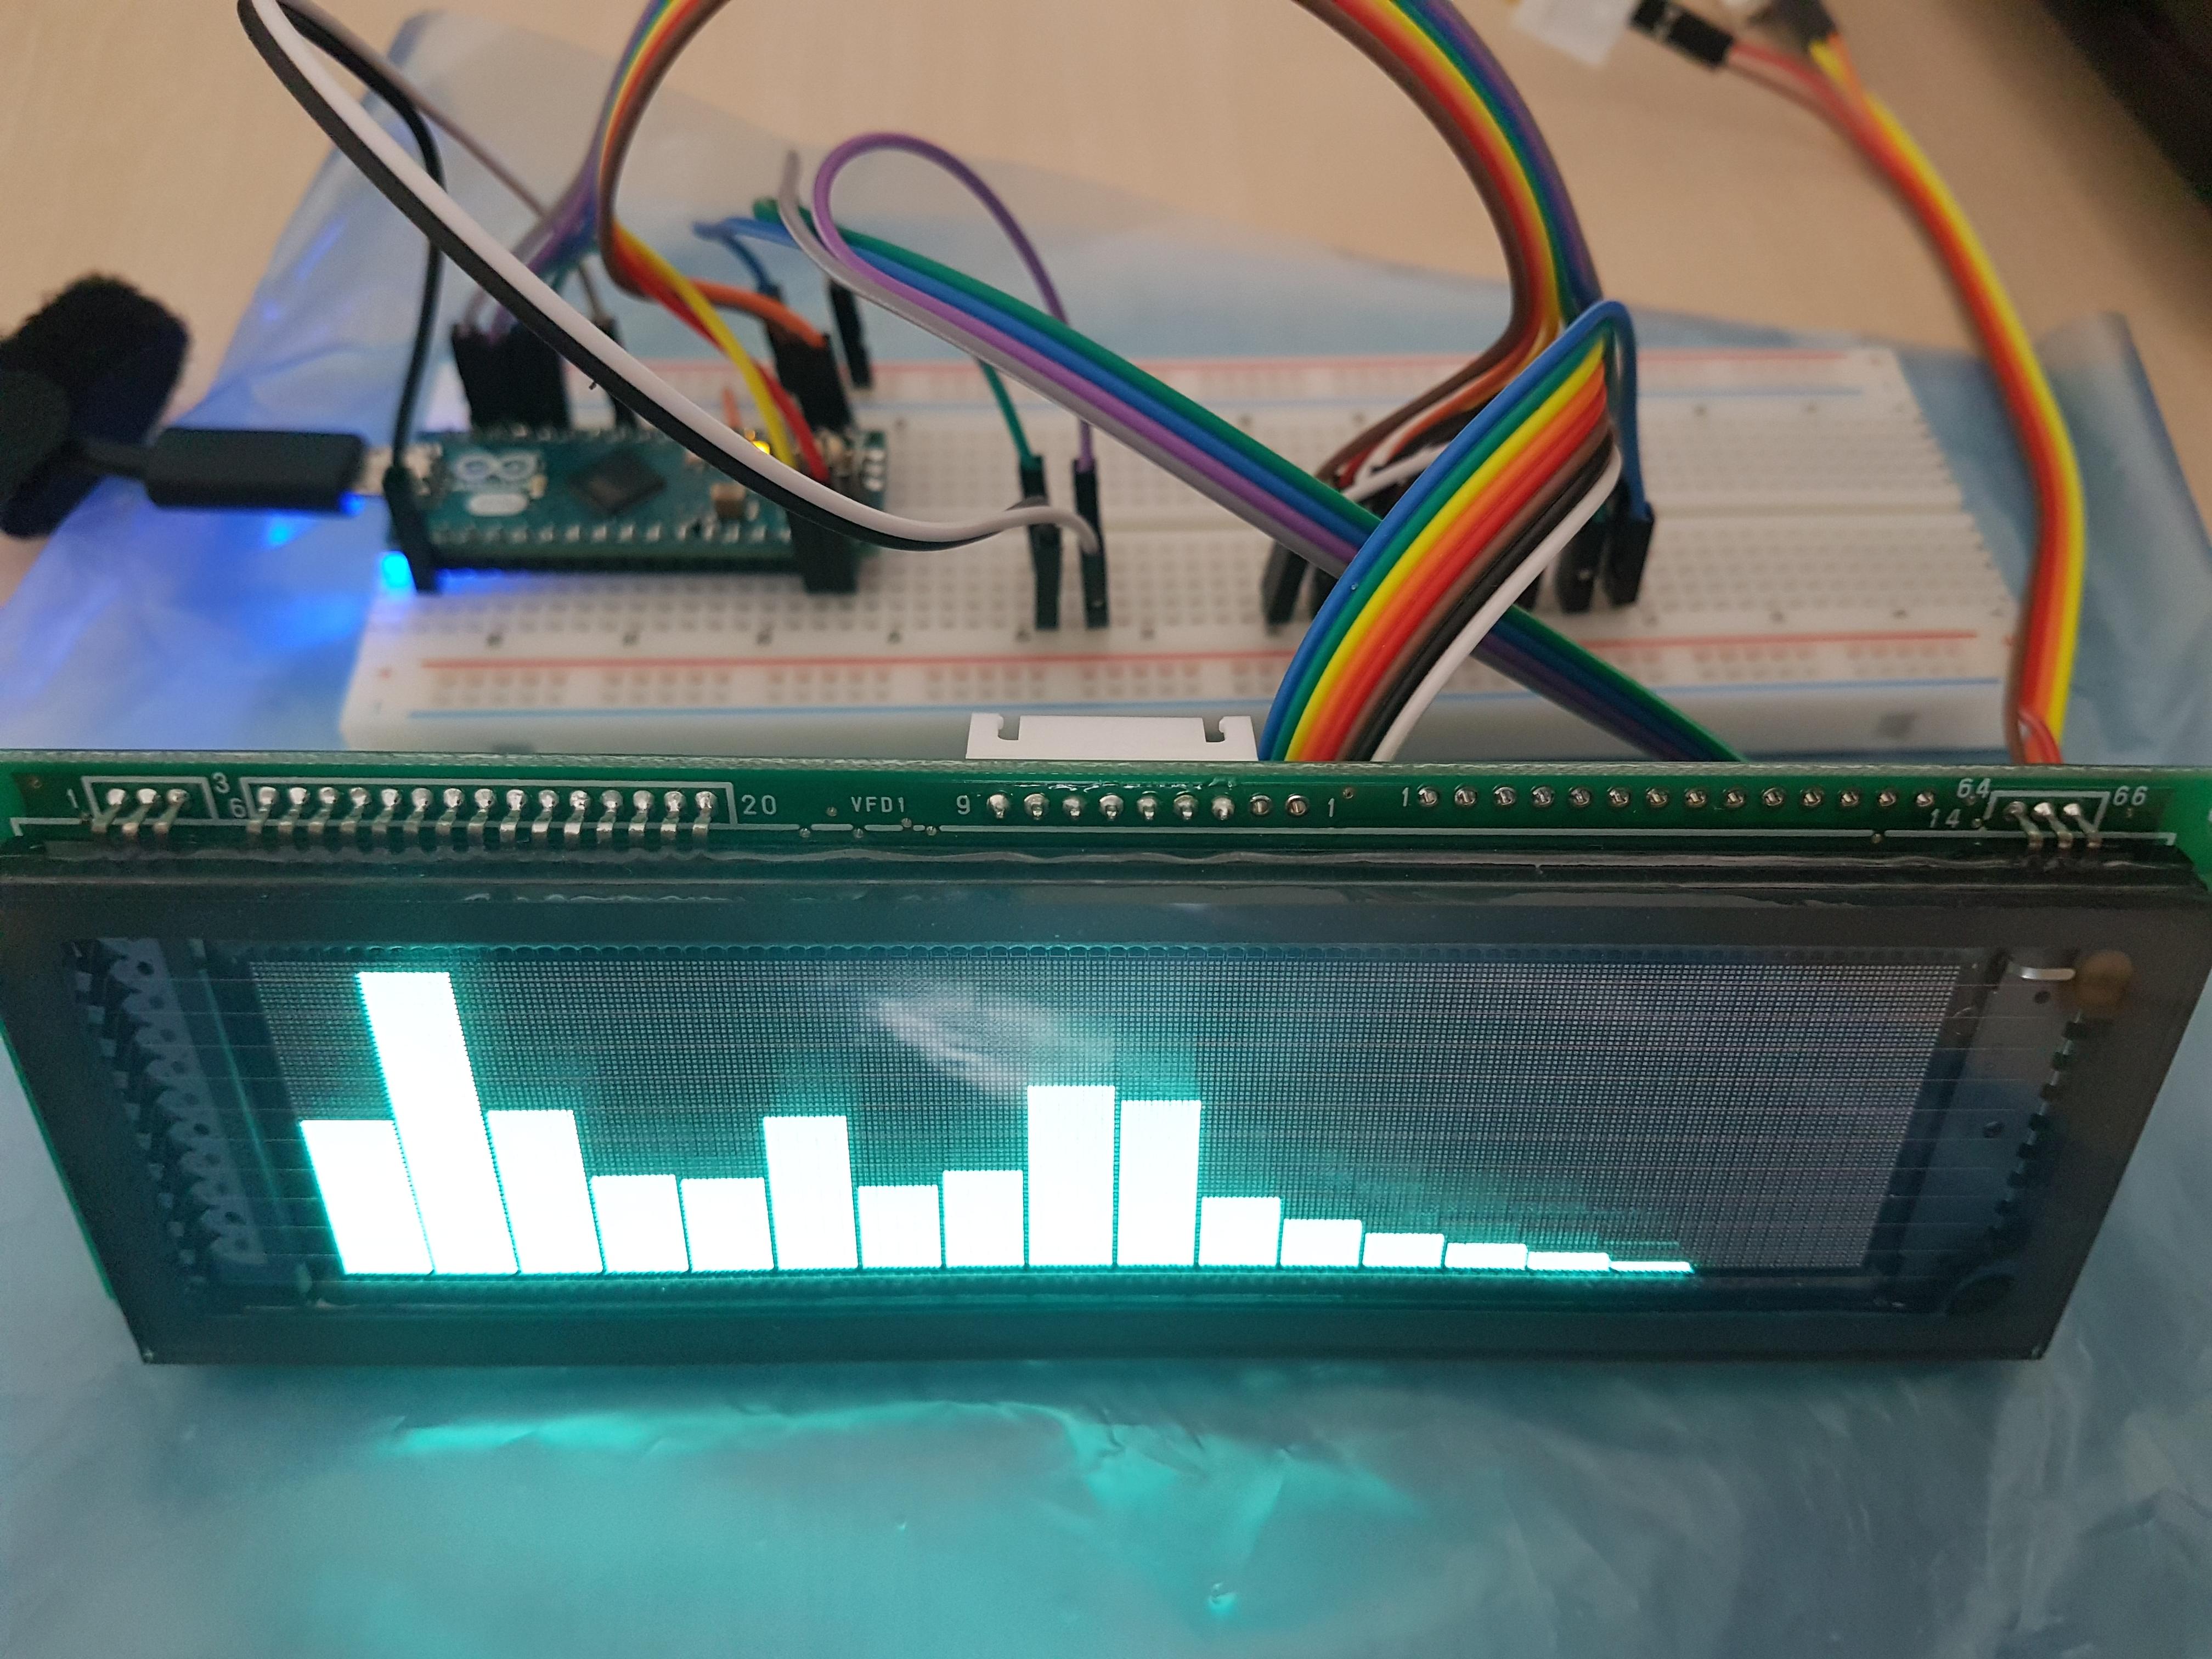 Noritake-GU256x64-39xx-and-Arduino-Micro.jpg